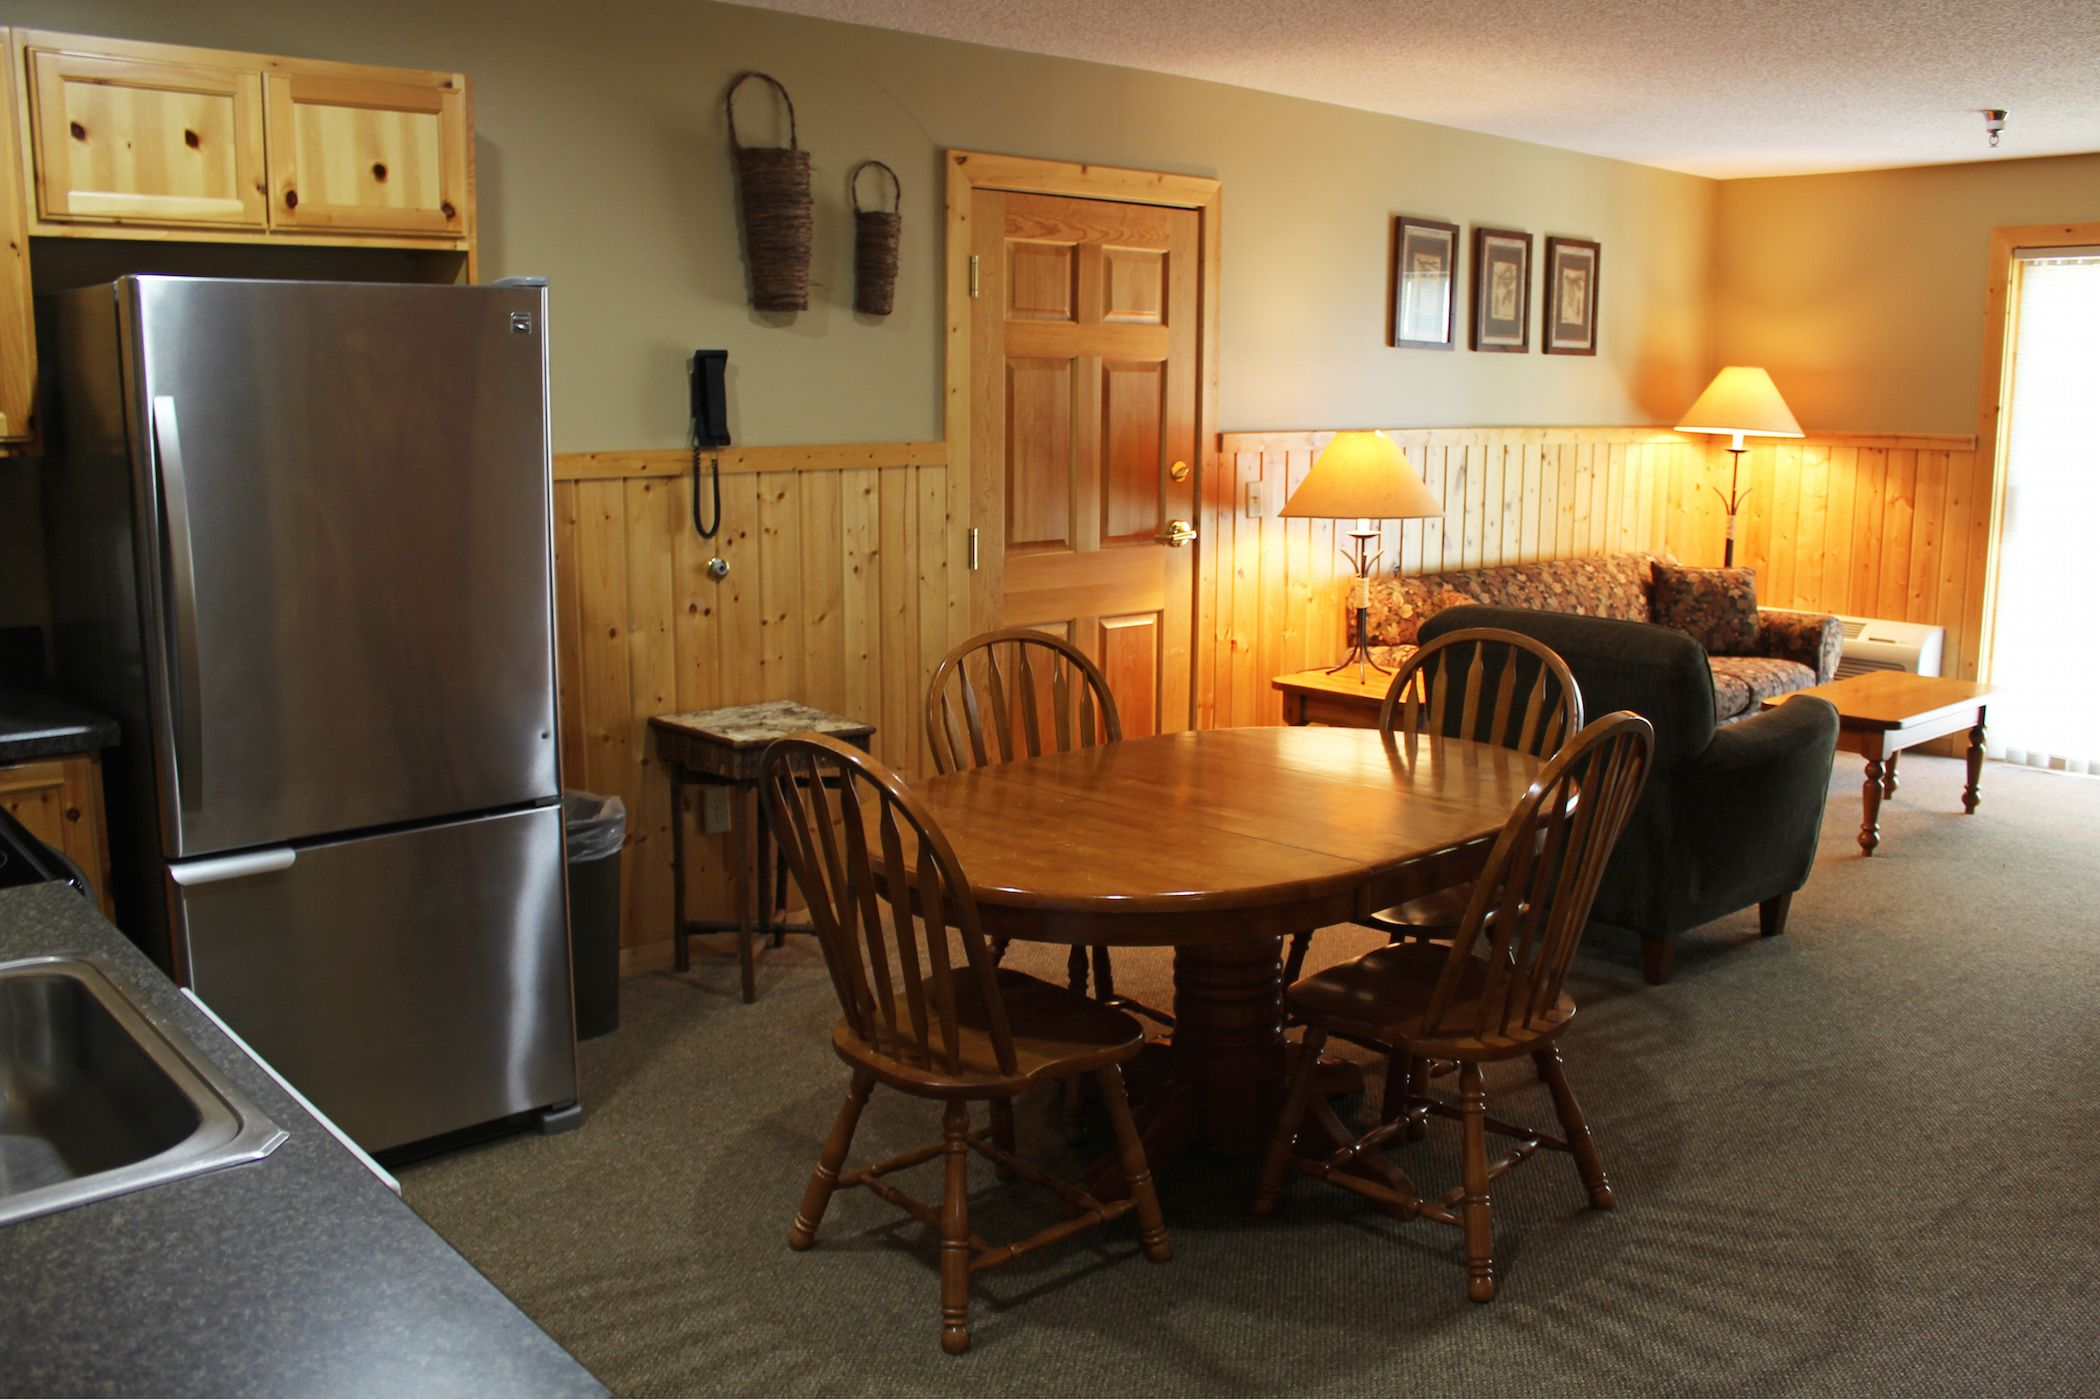 Lakefront Lodge Room Rentals in Minnesota Lake lodge, Lodge